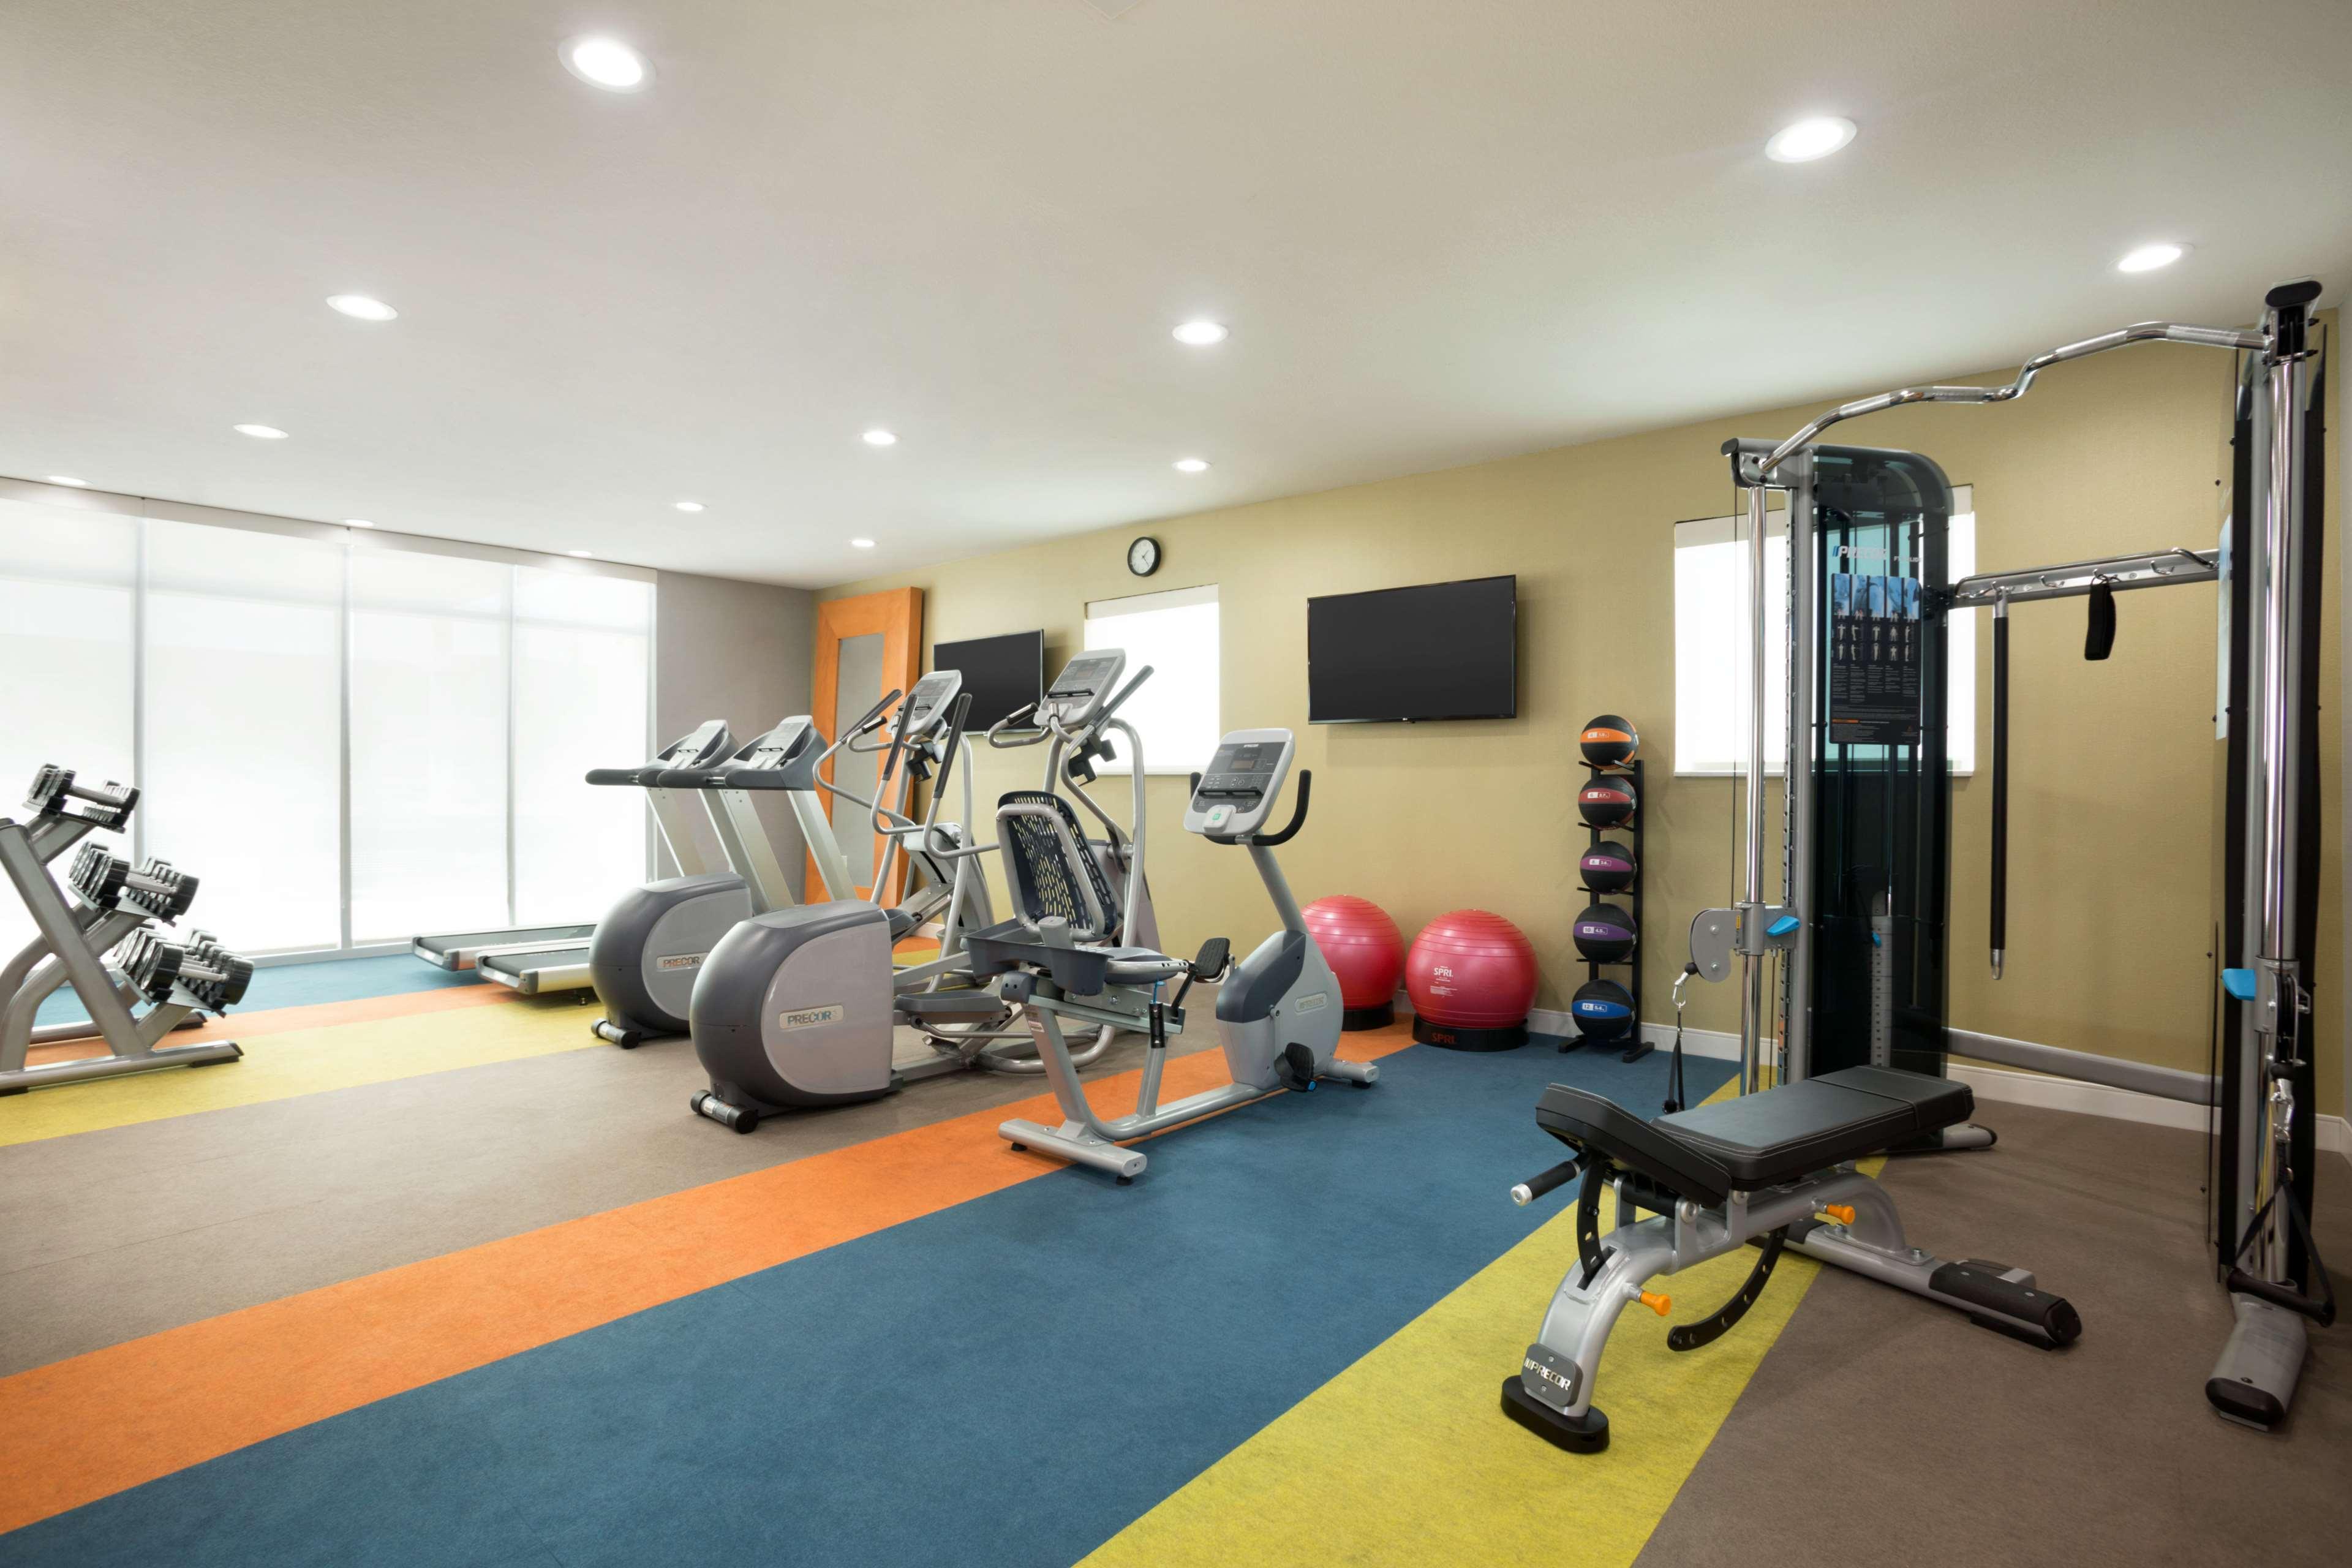 Home2 Suites by Hilton Houston/Webster image 10